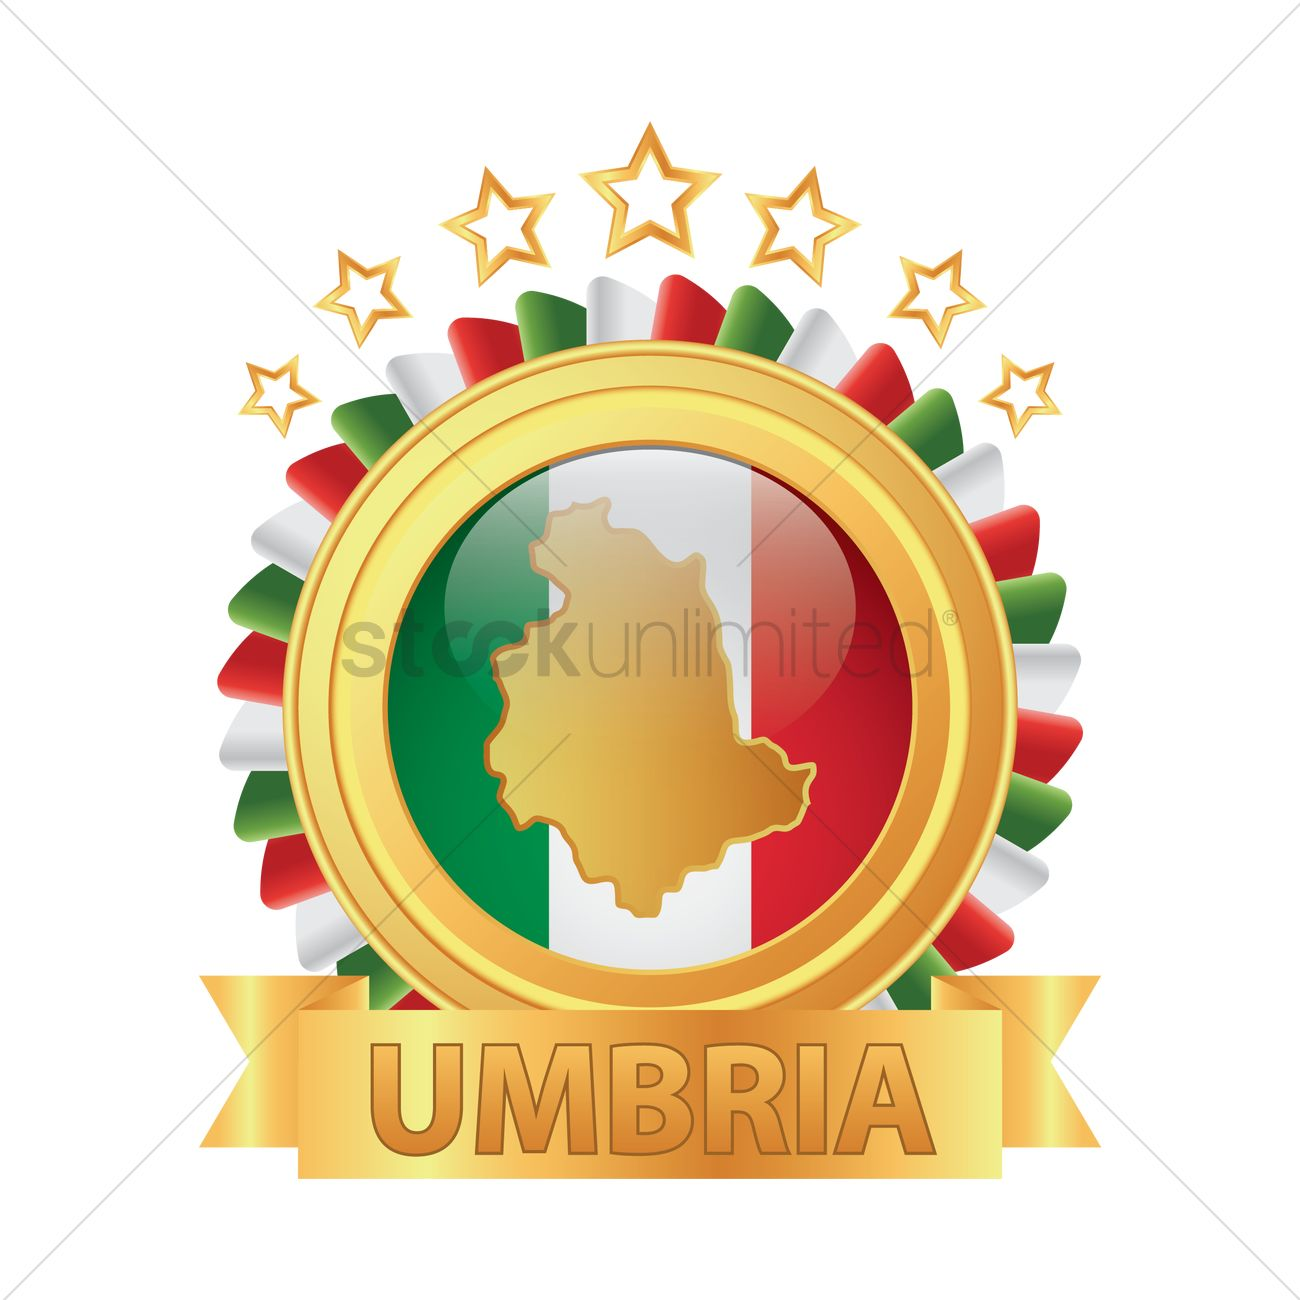 Umbria map Vector Image.